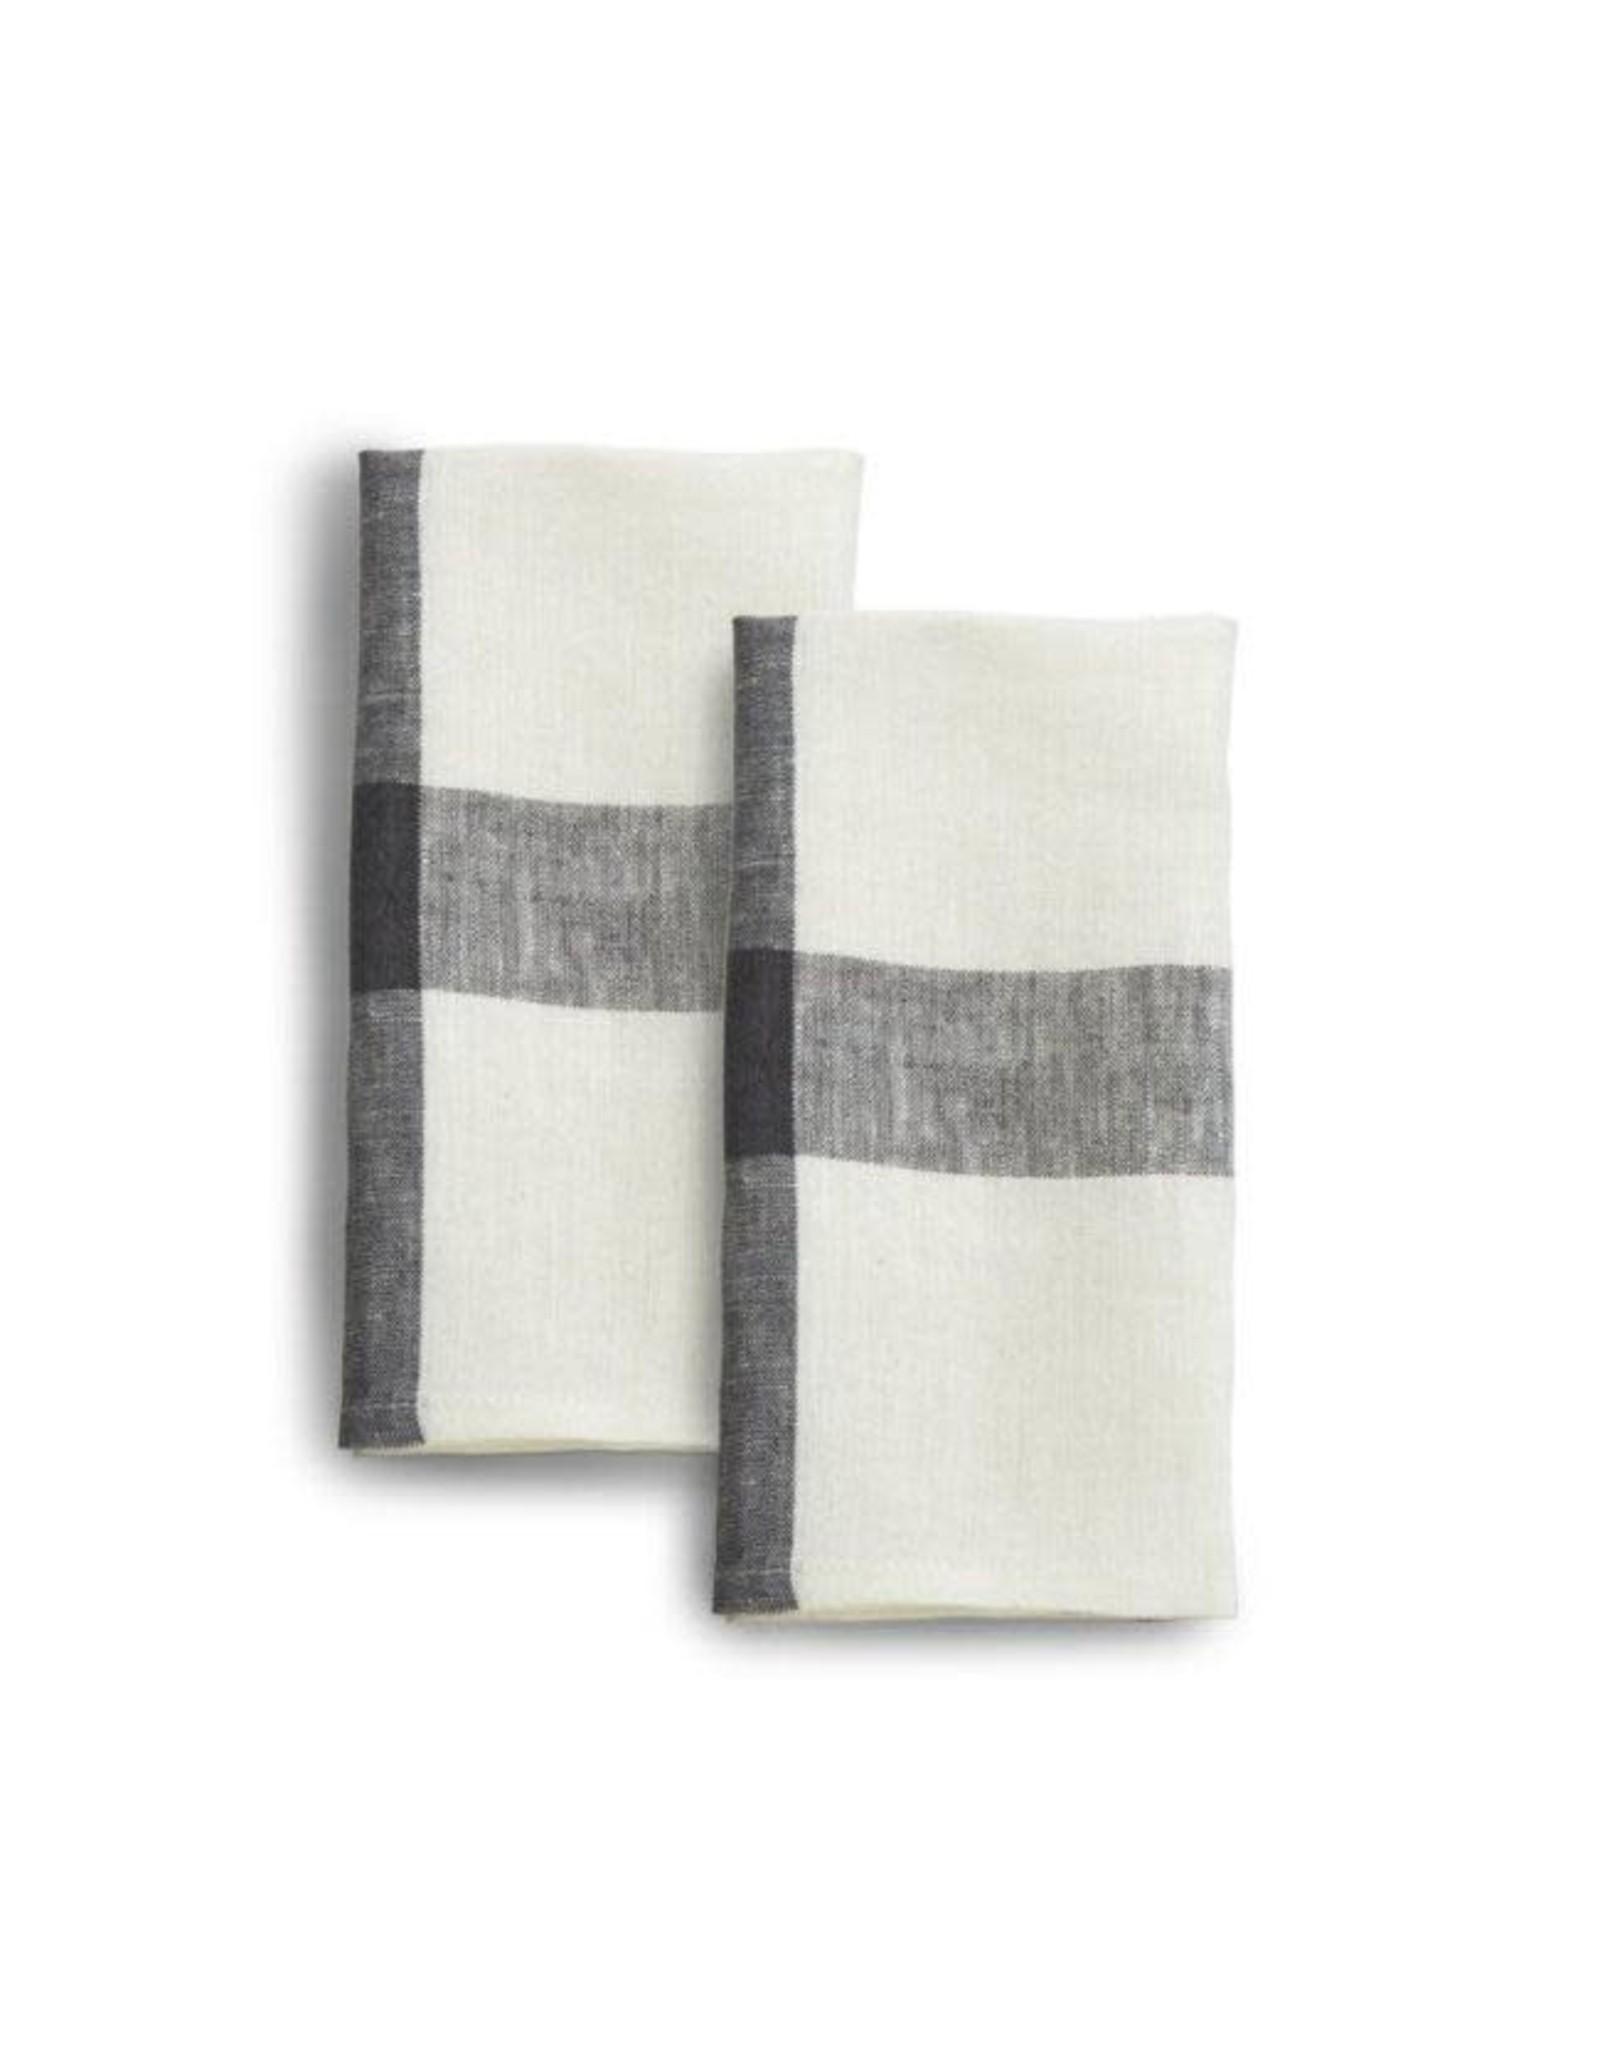 India, Linen, 20 x 20 Napkins, Set of 2 Blue Corn